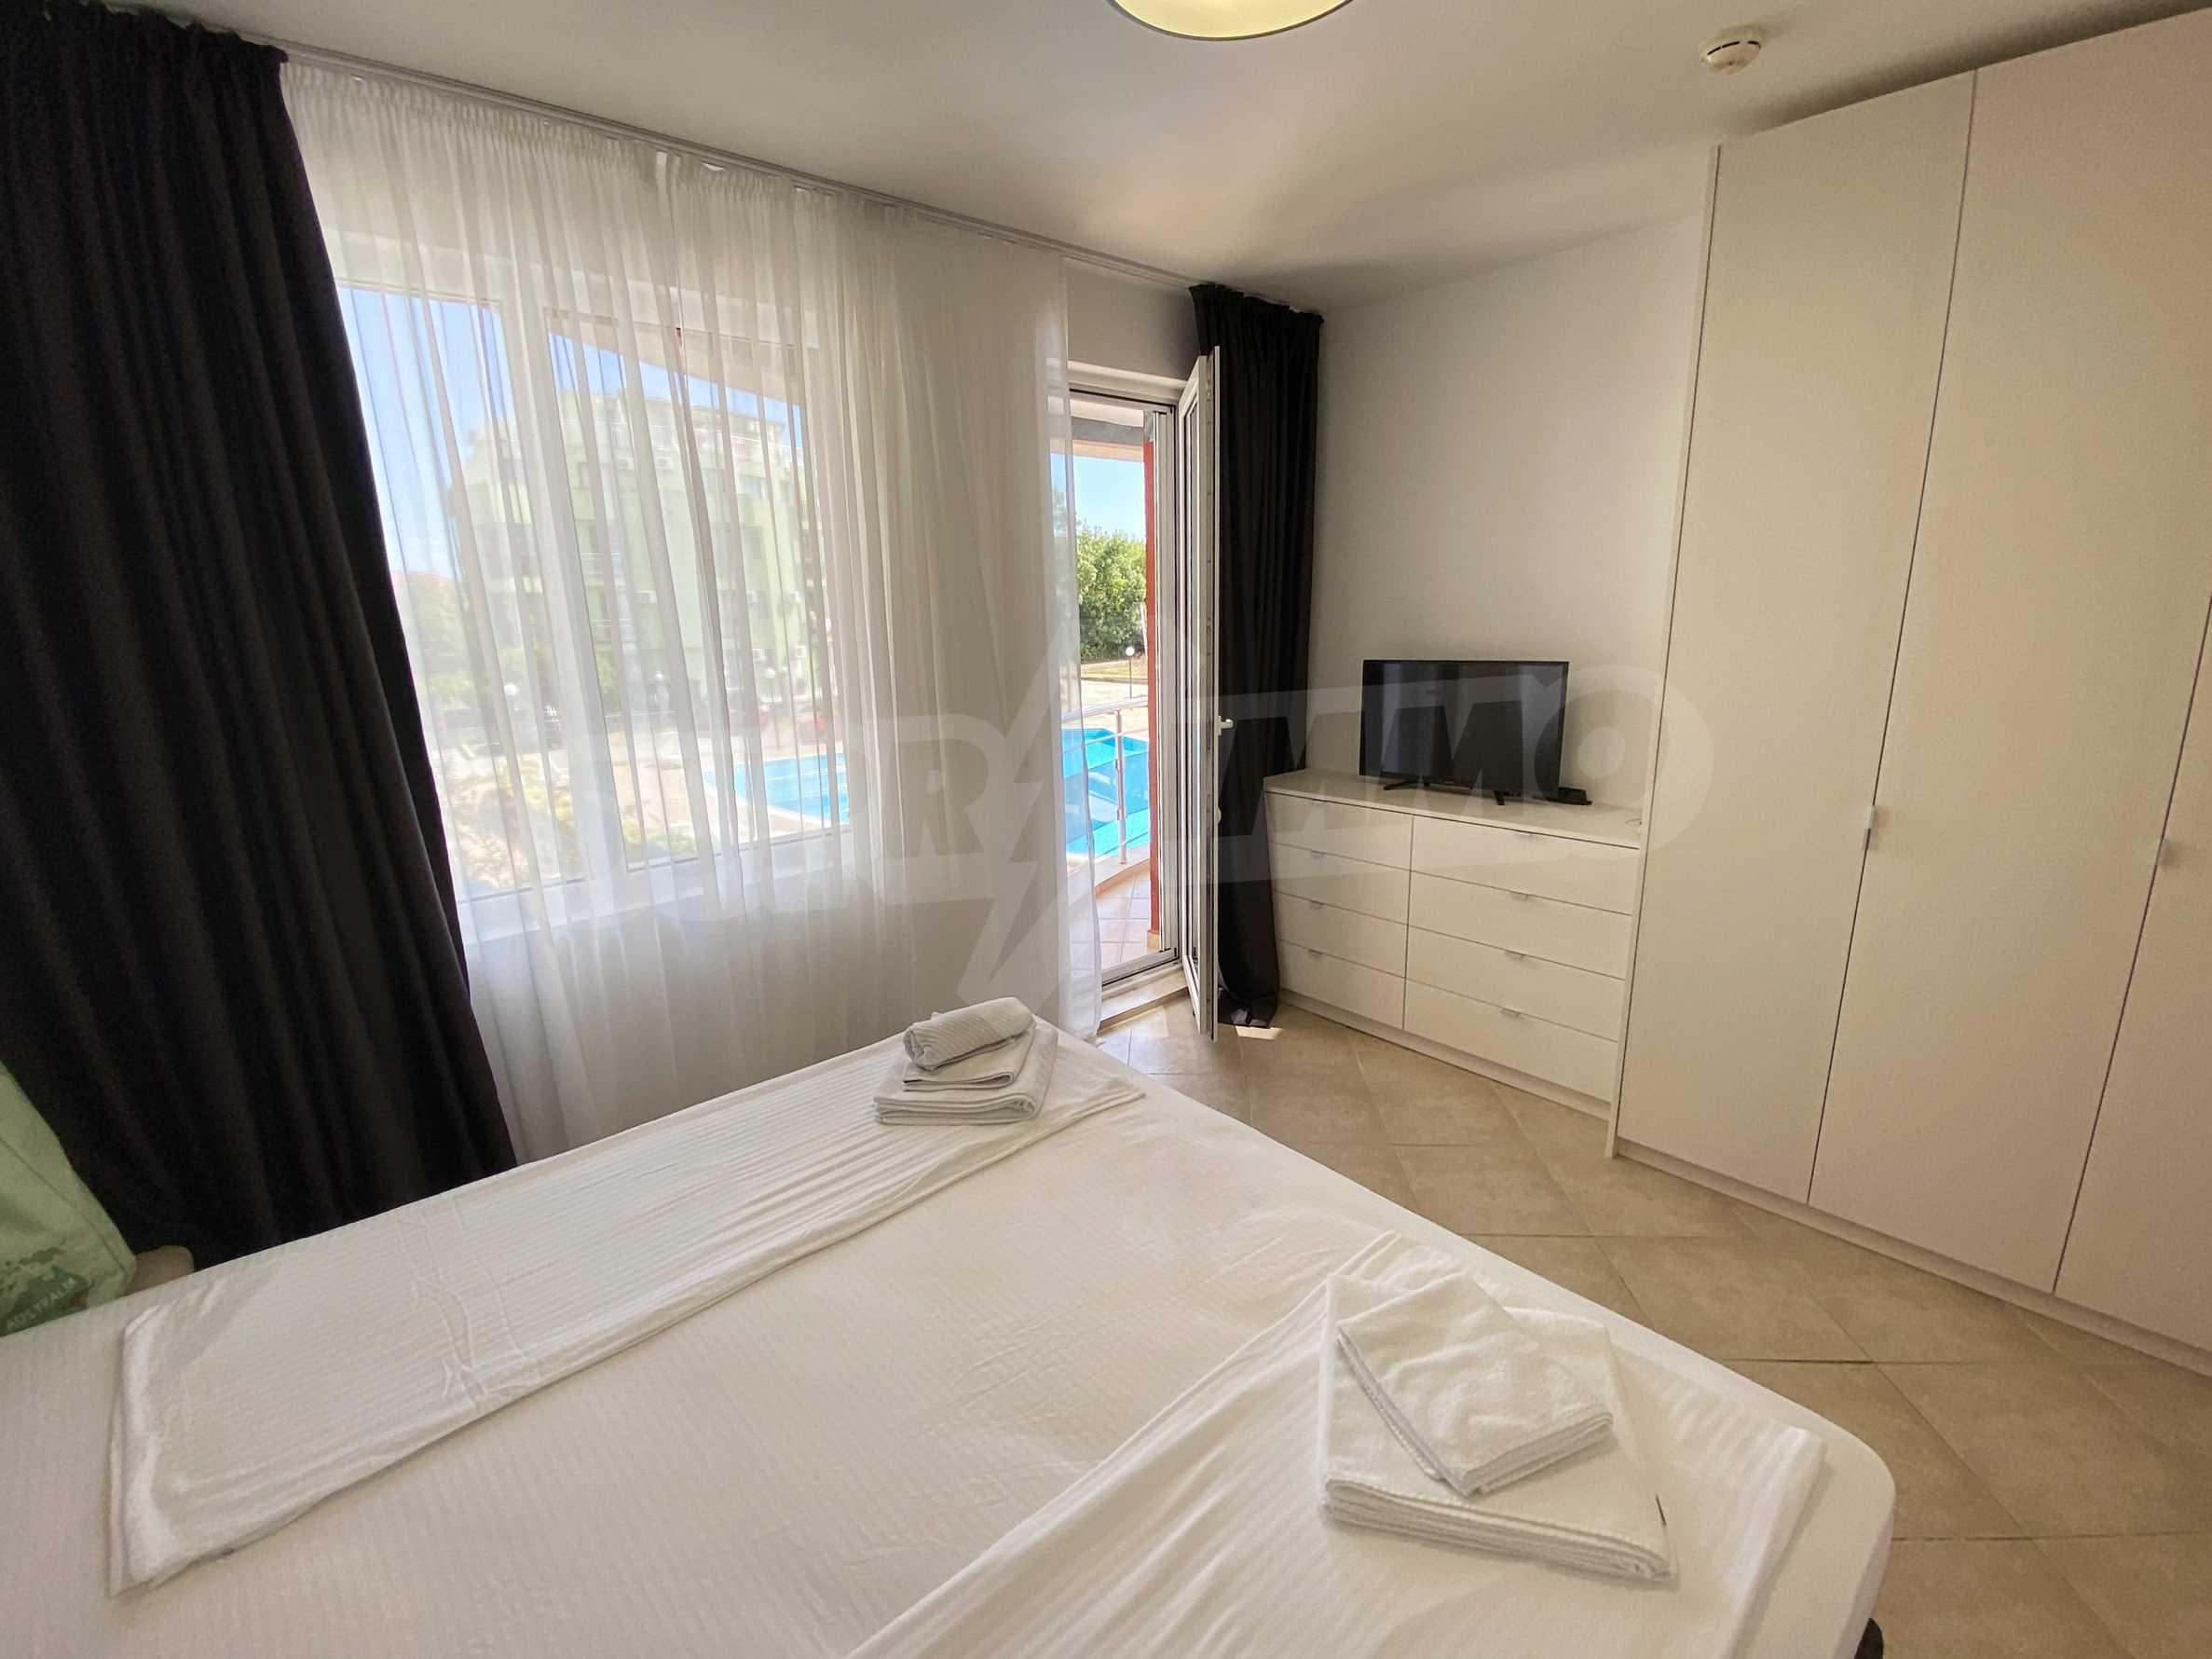 Тристаен апартамент близо до плажа в комплекс Емберли в Лозенец (ап. №201) 20